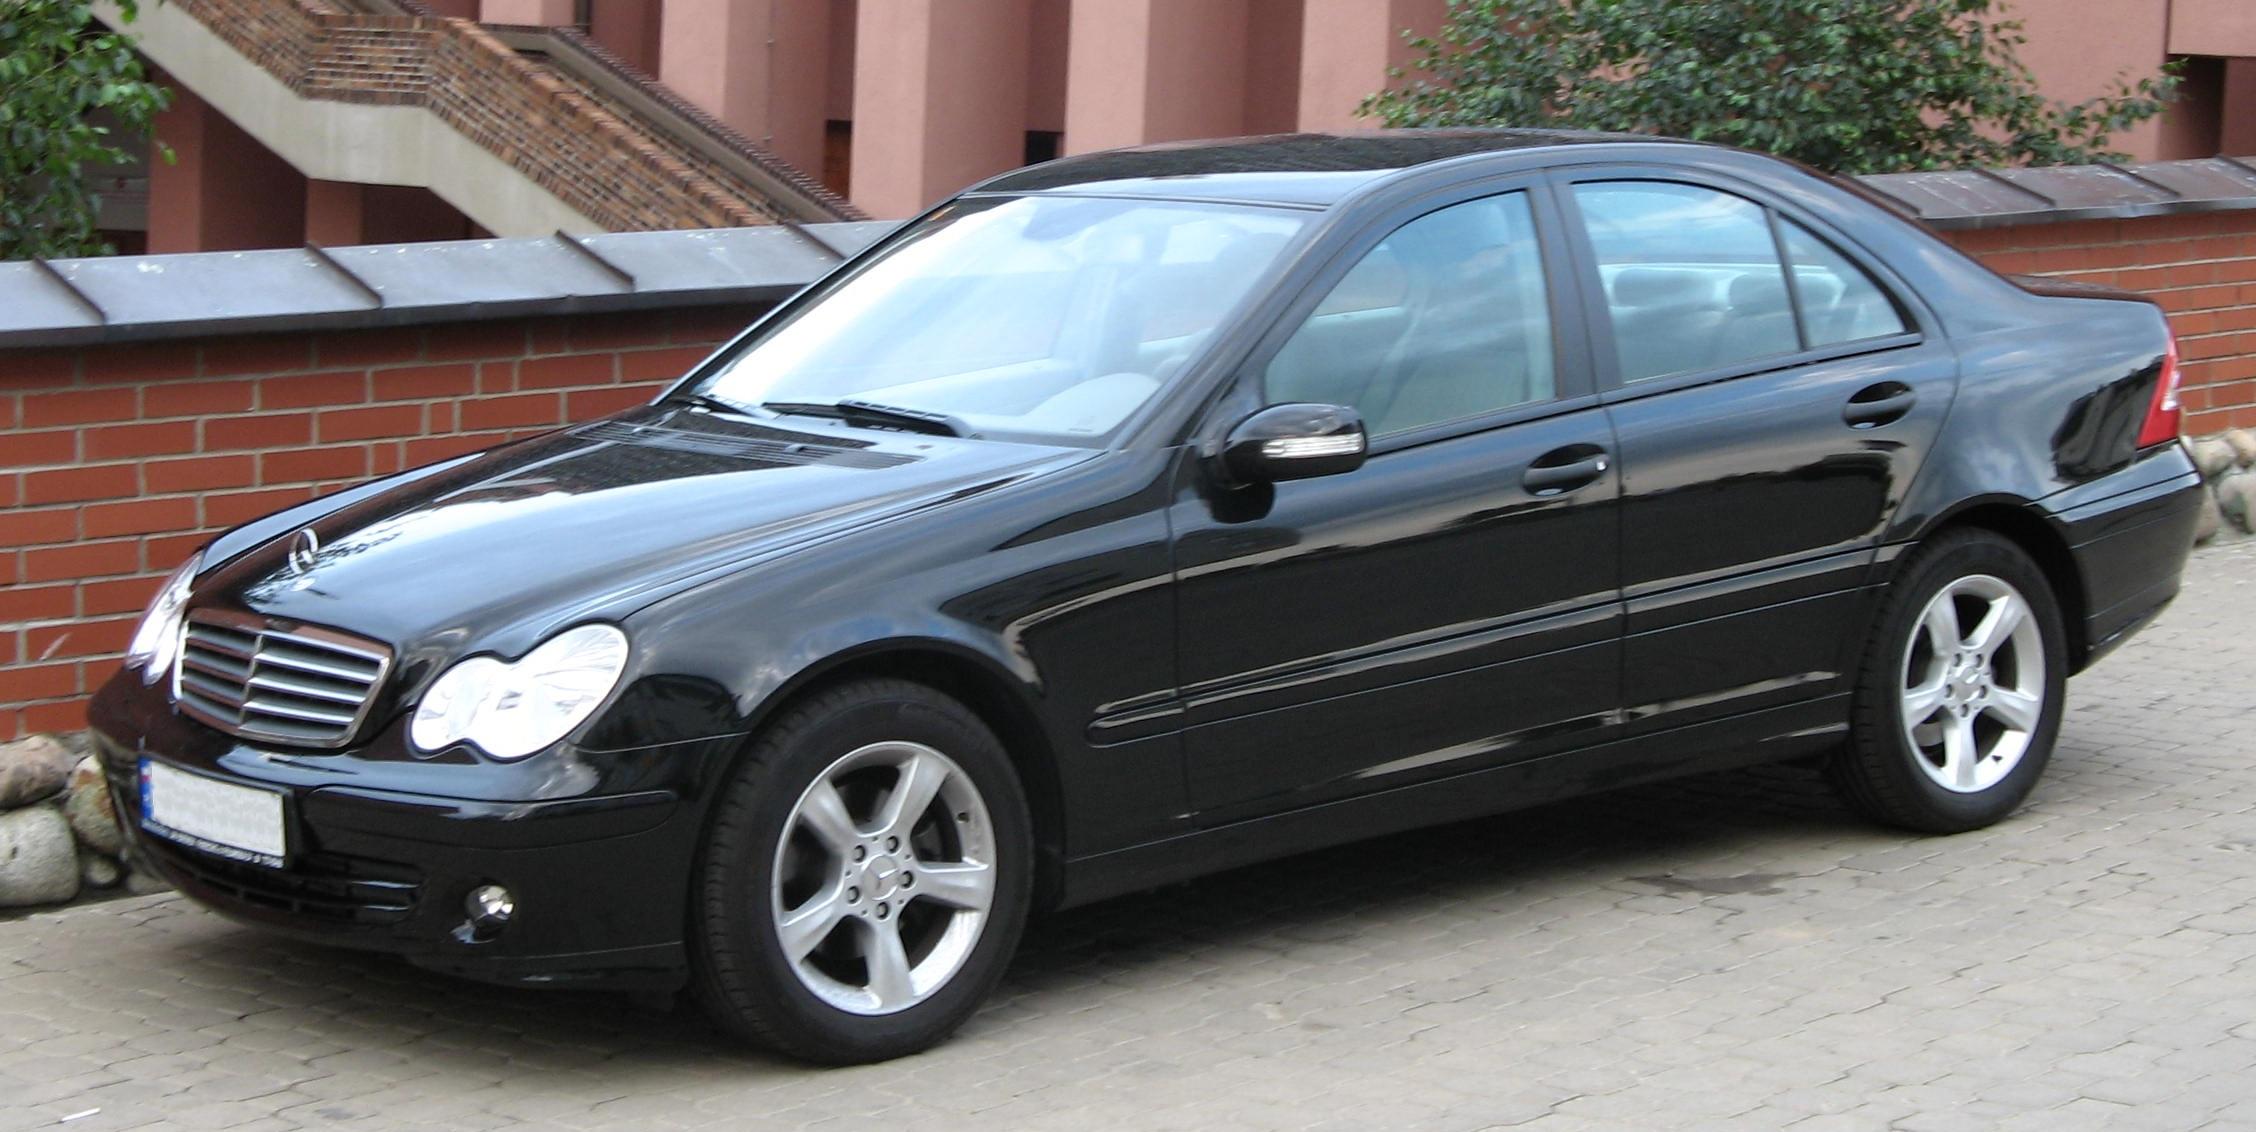 Mercedes benz c180 kompressor picture 6 reviews news for Buy my mercedes benz